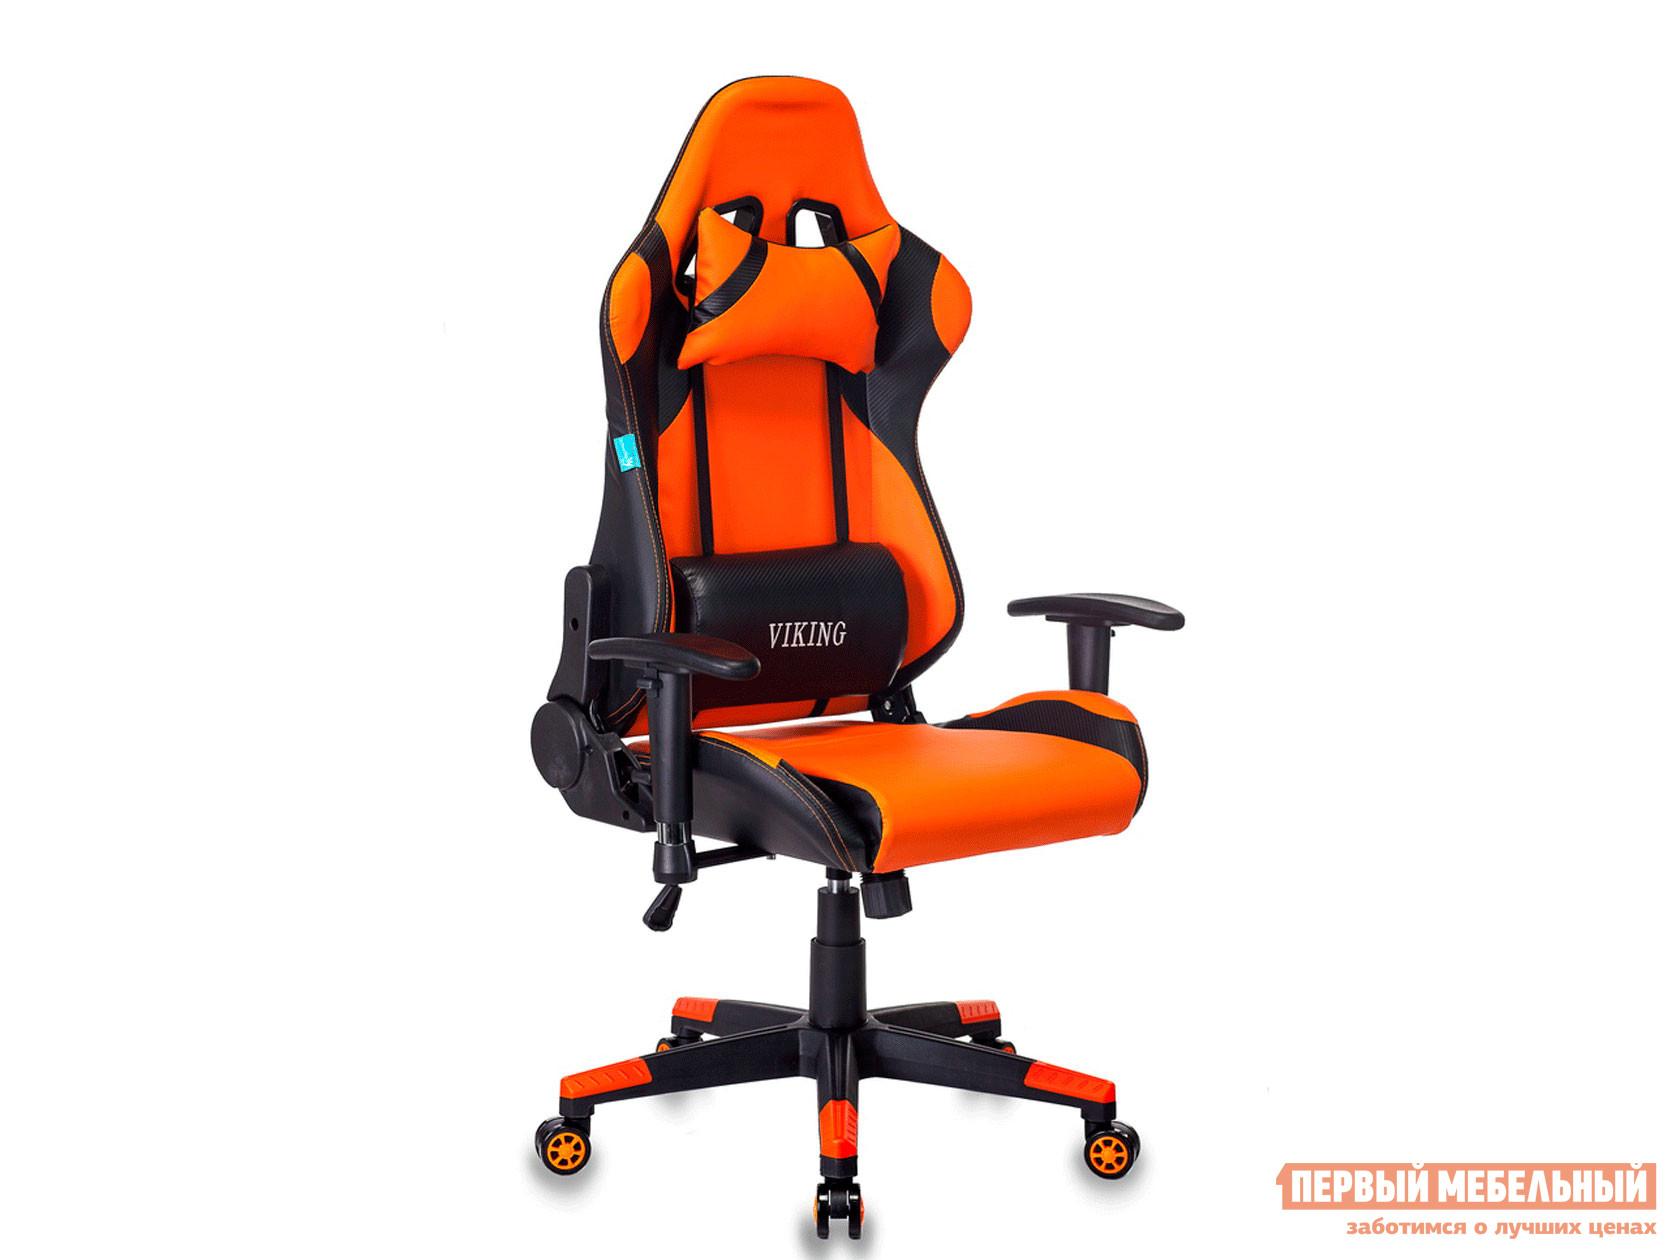 Игровое кресло Бюрократ Игровое кресло CH-778N кресло игровое dxracer dxracer drifting oh dj133 n